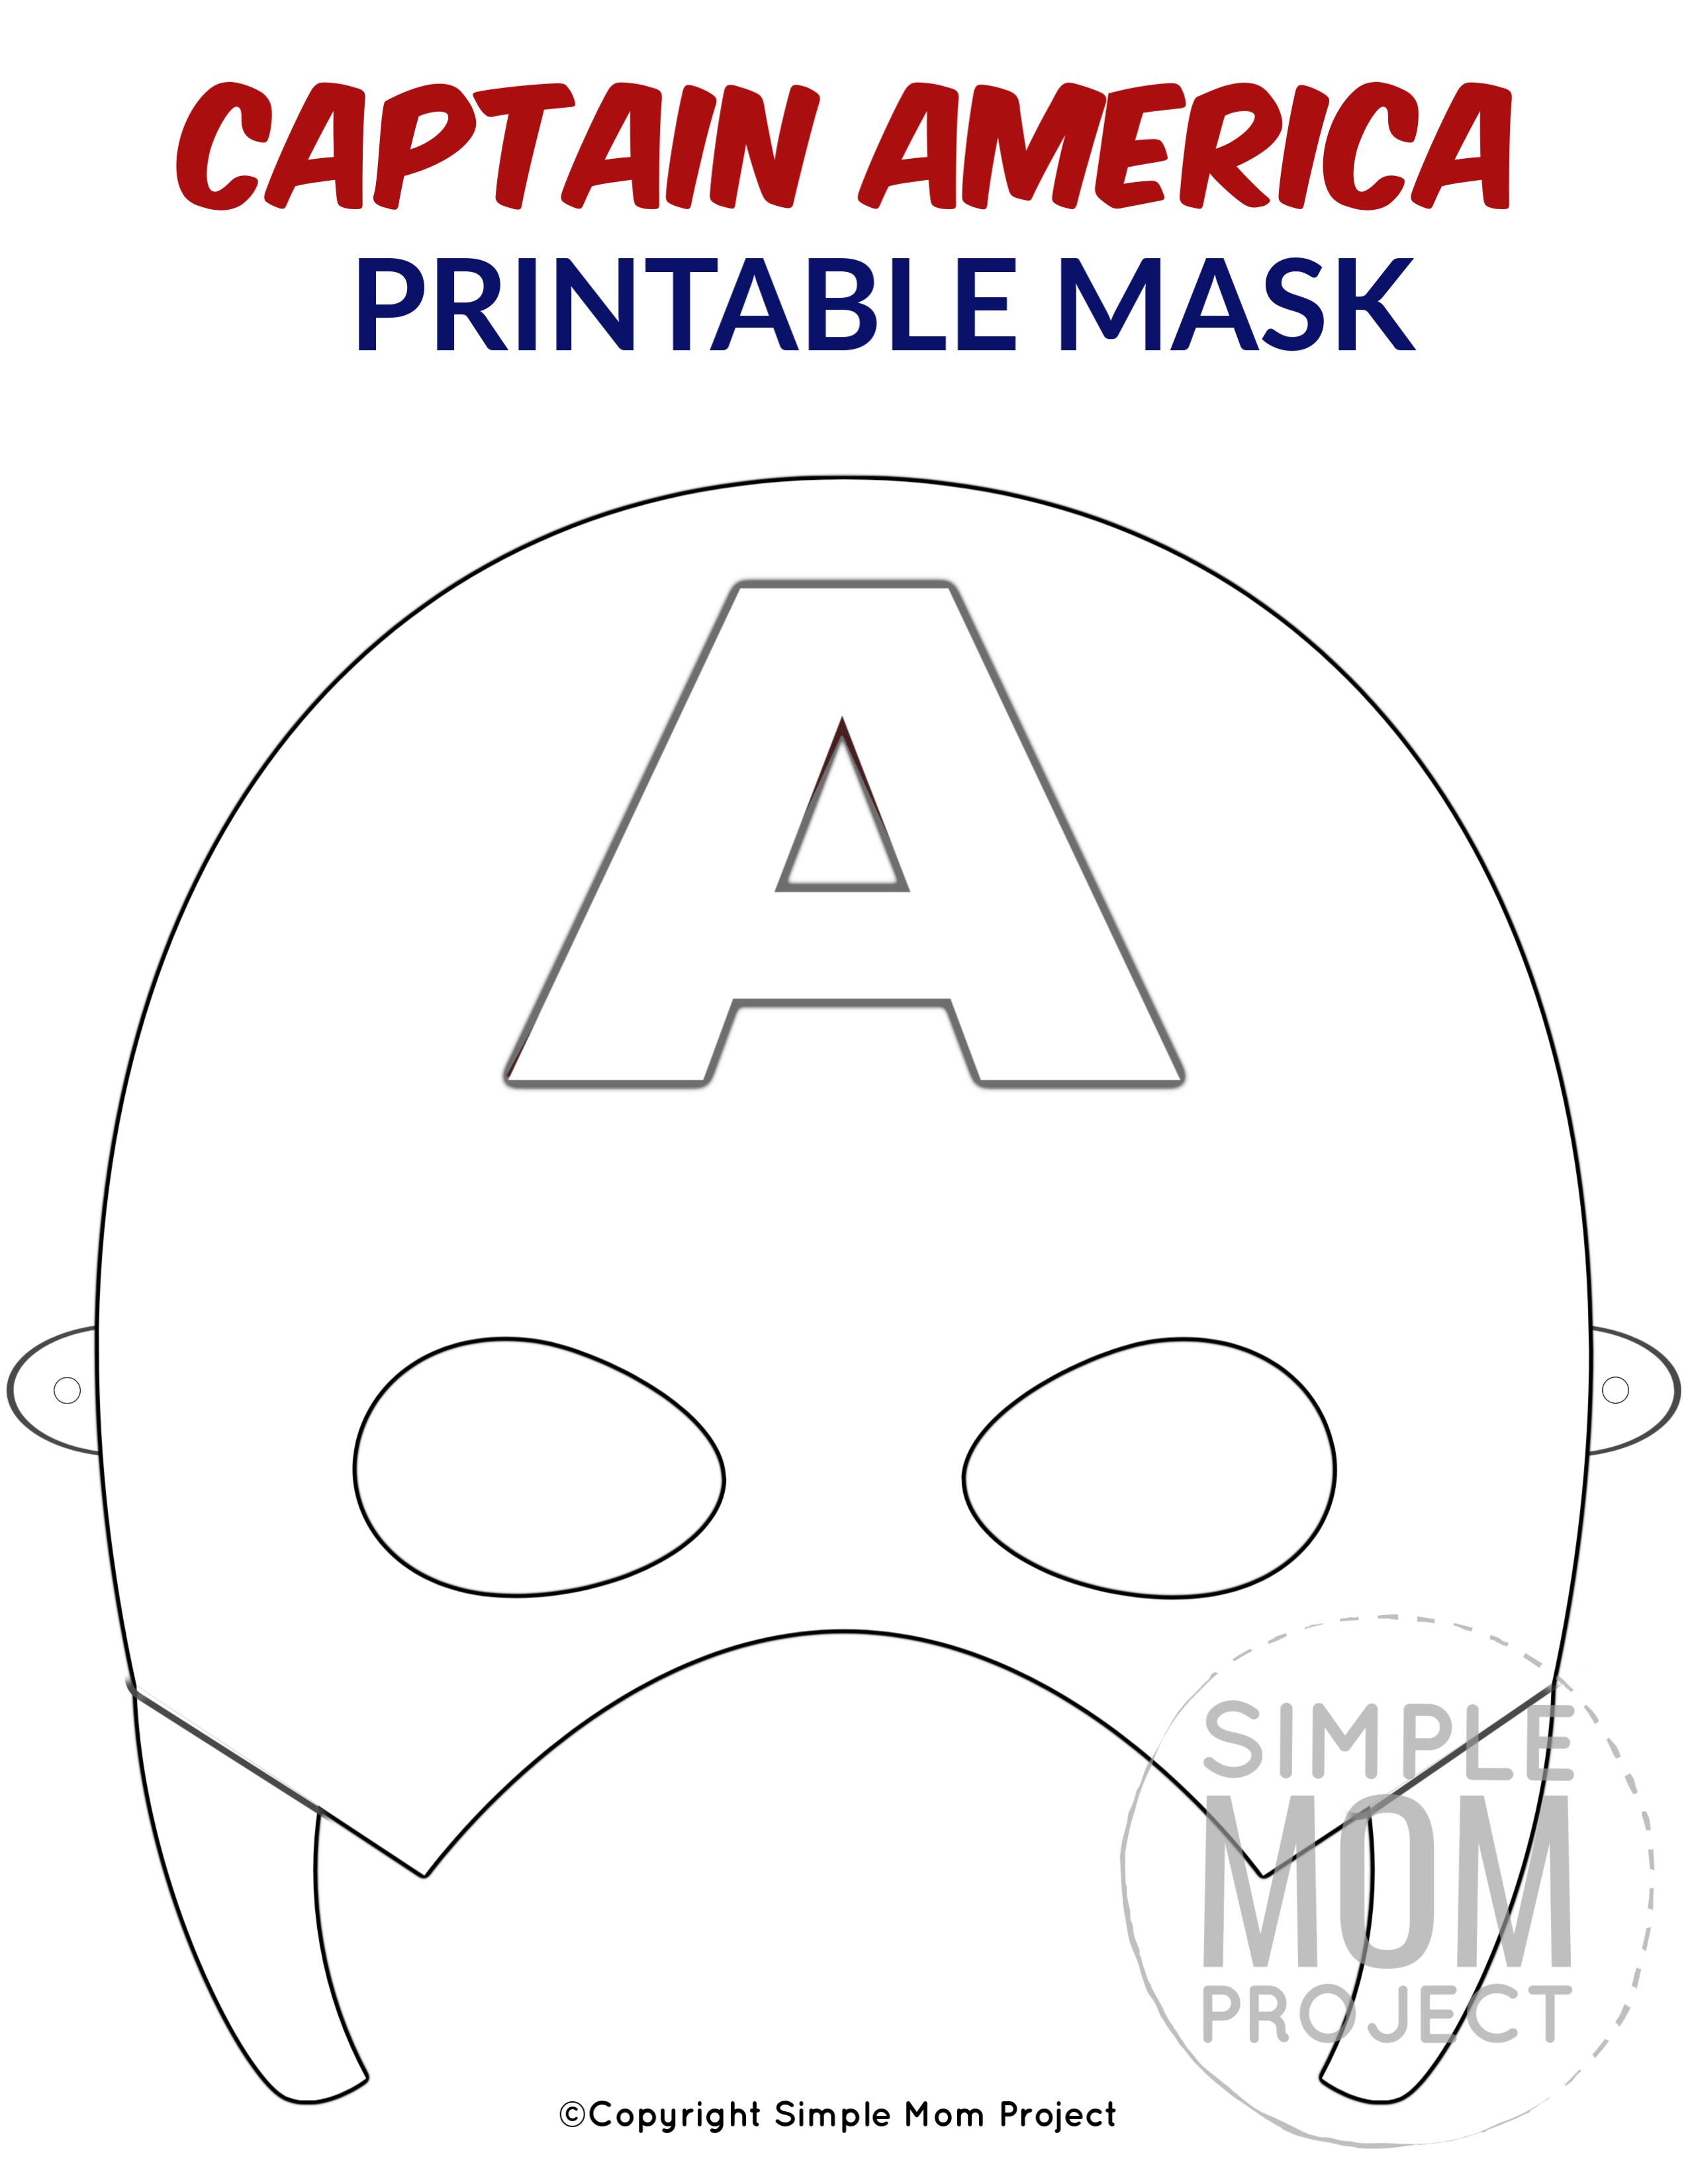 Free Printable Captain America Mask Template Captain America Coloring Pages Superhero Mask Template Captain America Mask